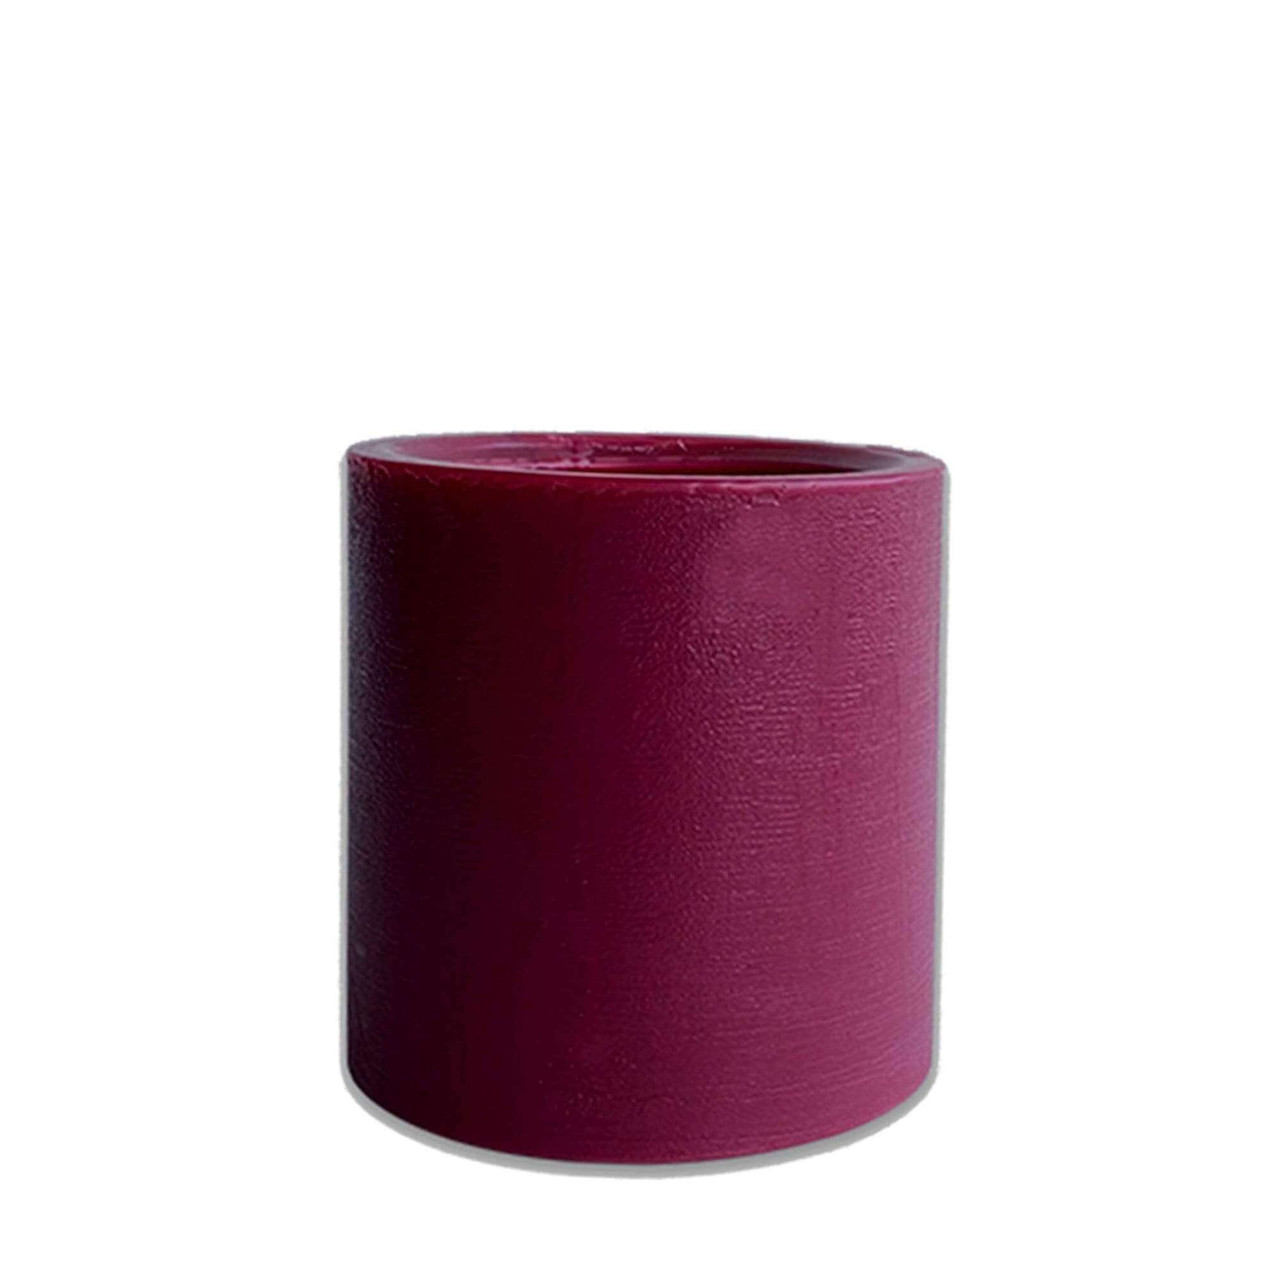 Cranberry Mango Spiral Light Candle Medium